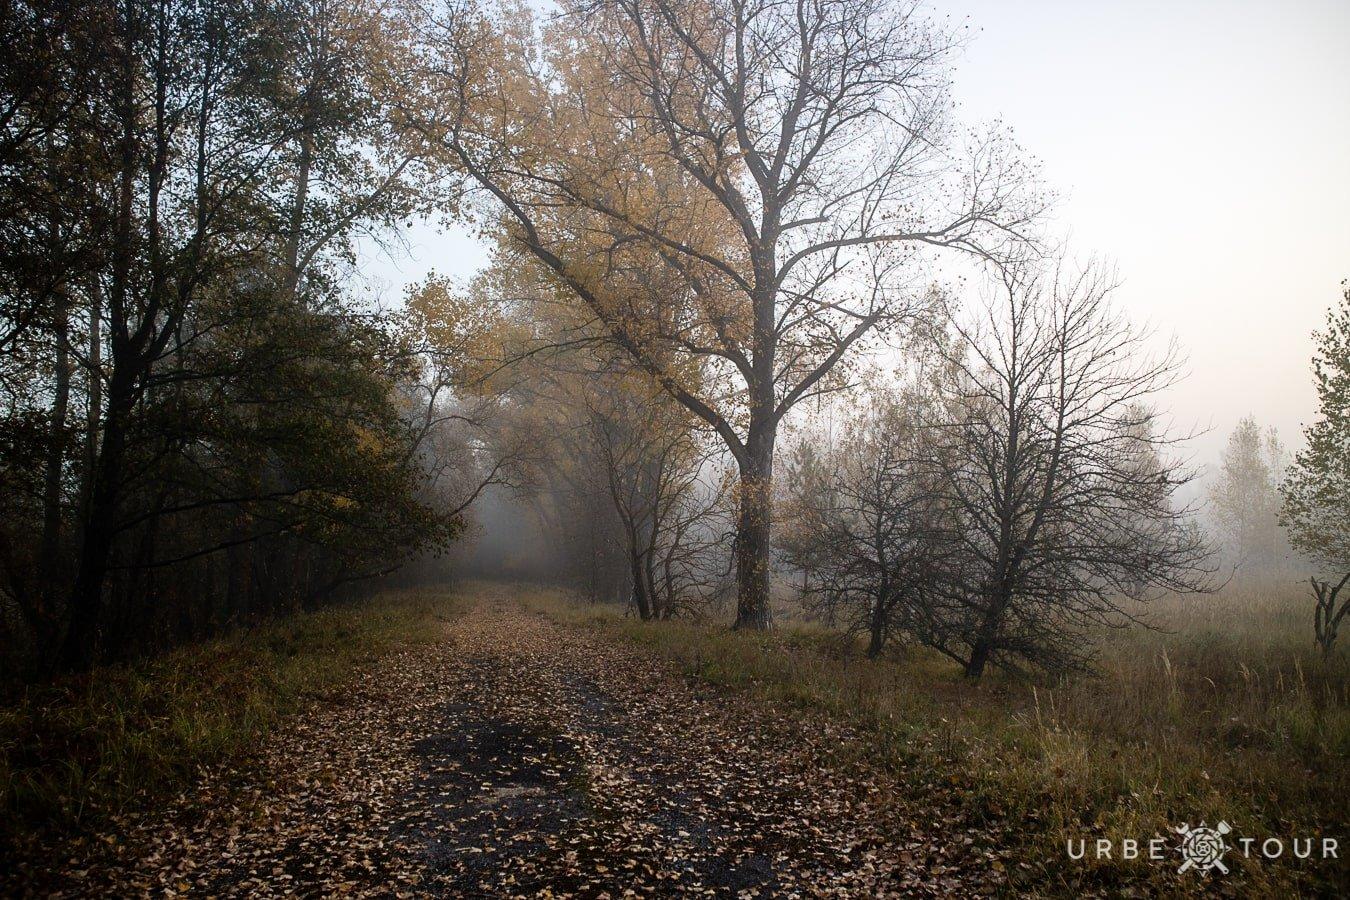 foggy morning in chernobyl zone